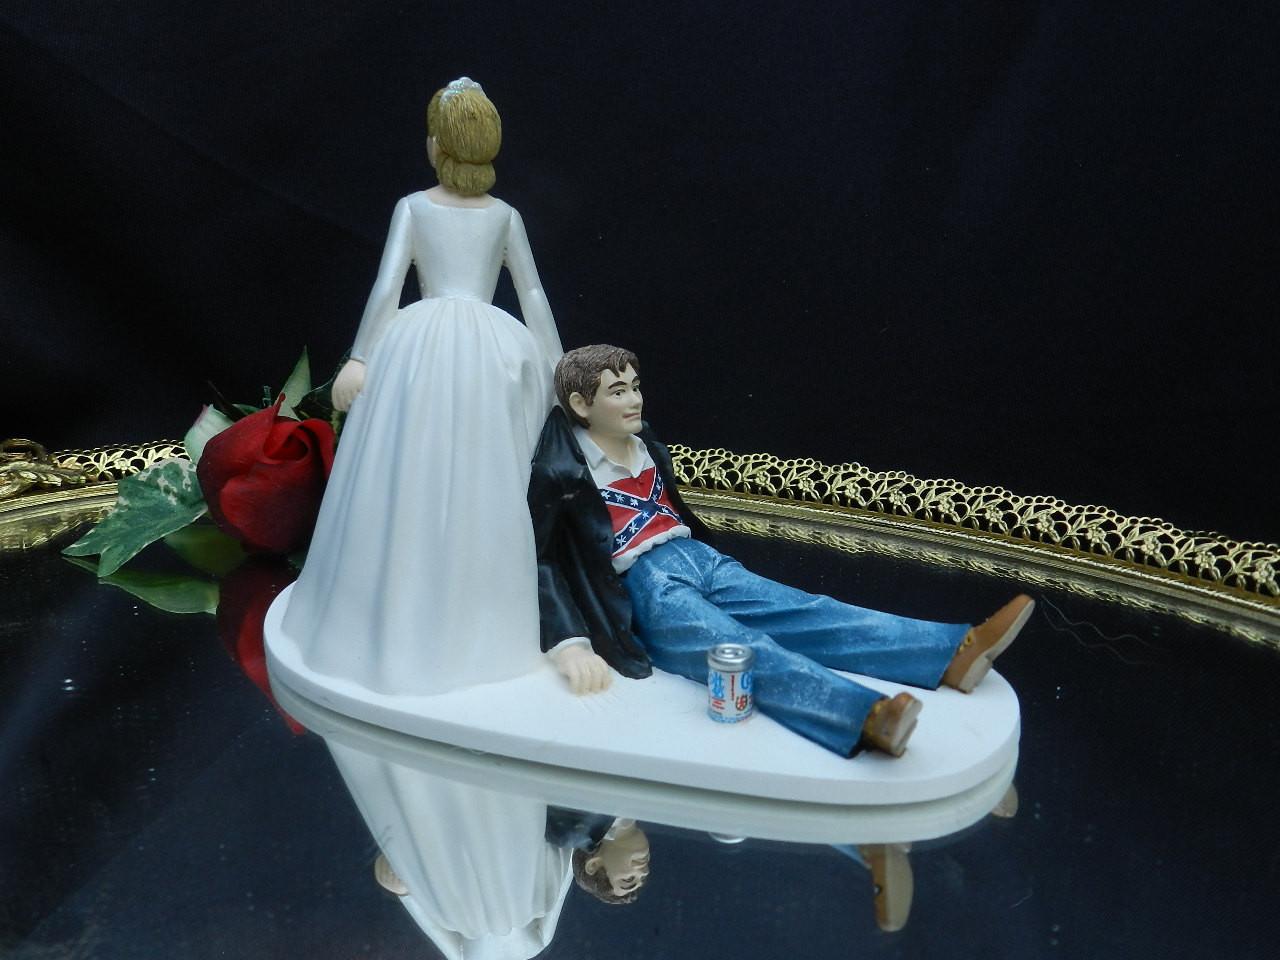 Redneck Wedding Cakes Toppers  wedding cake toppers Redneck Wedding Cake Toppers